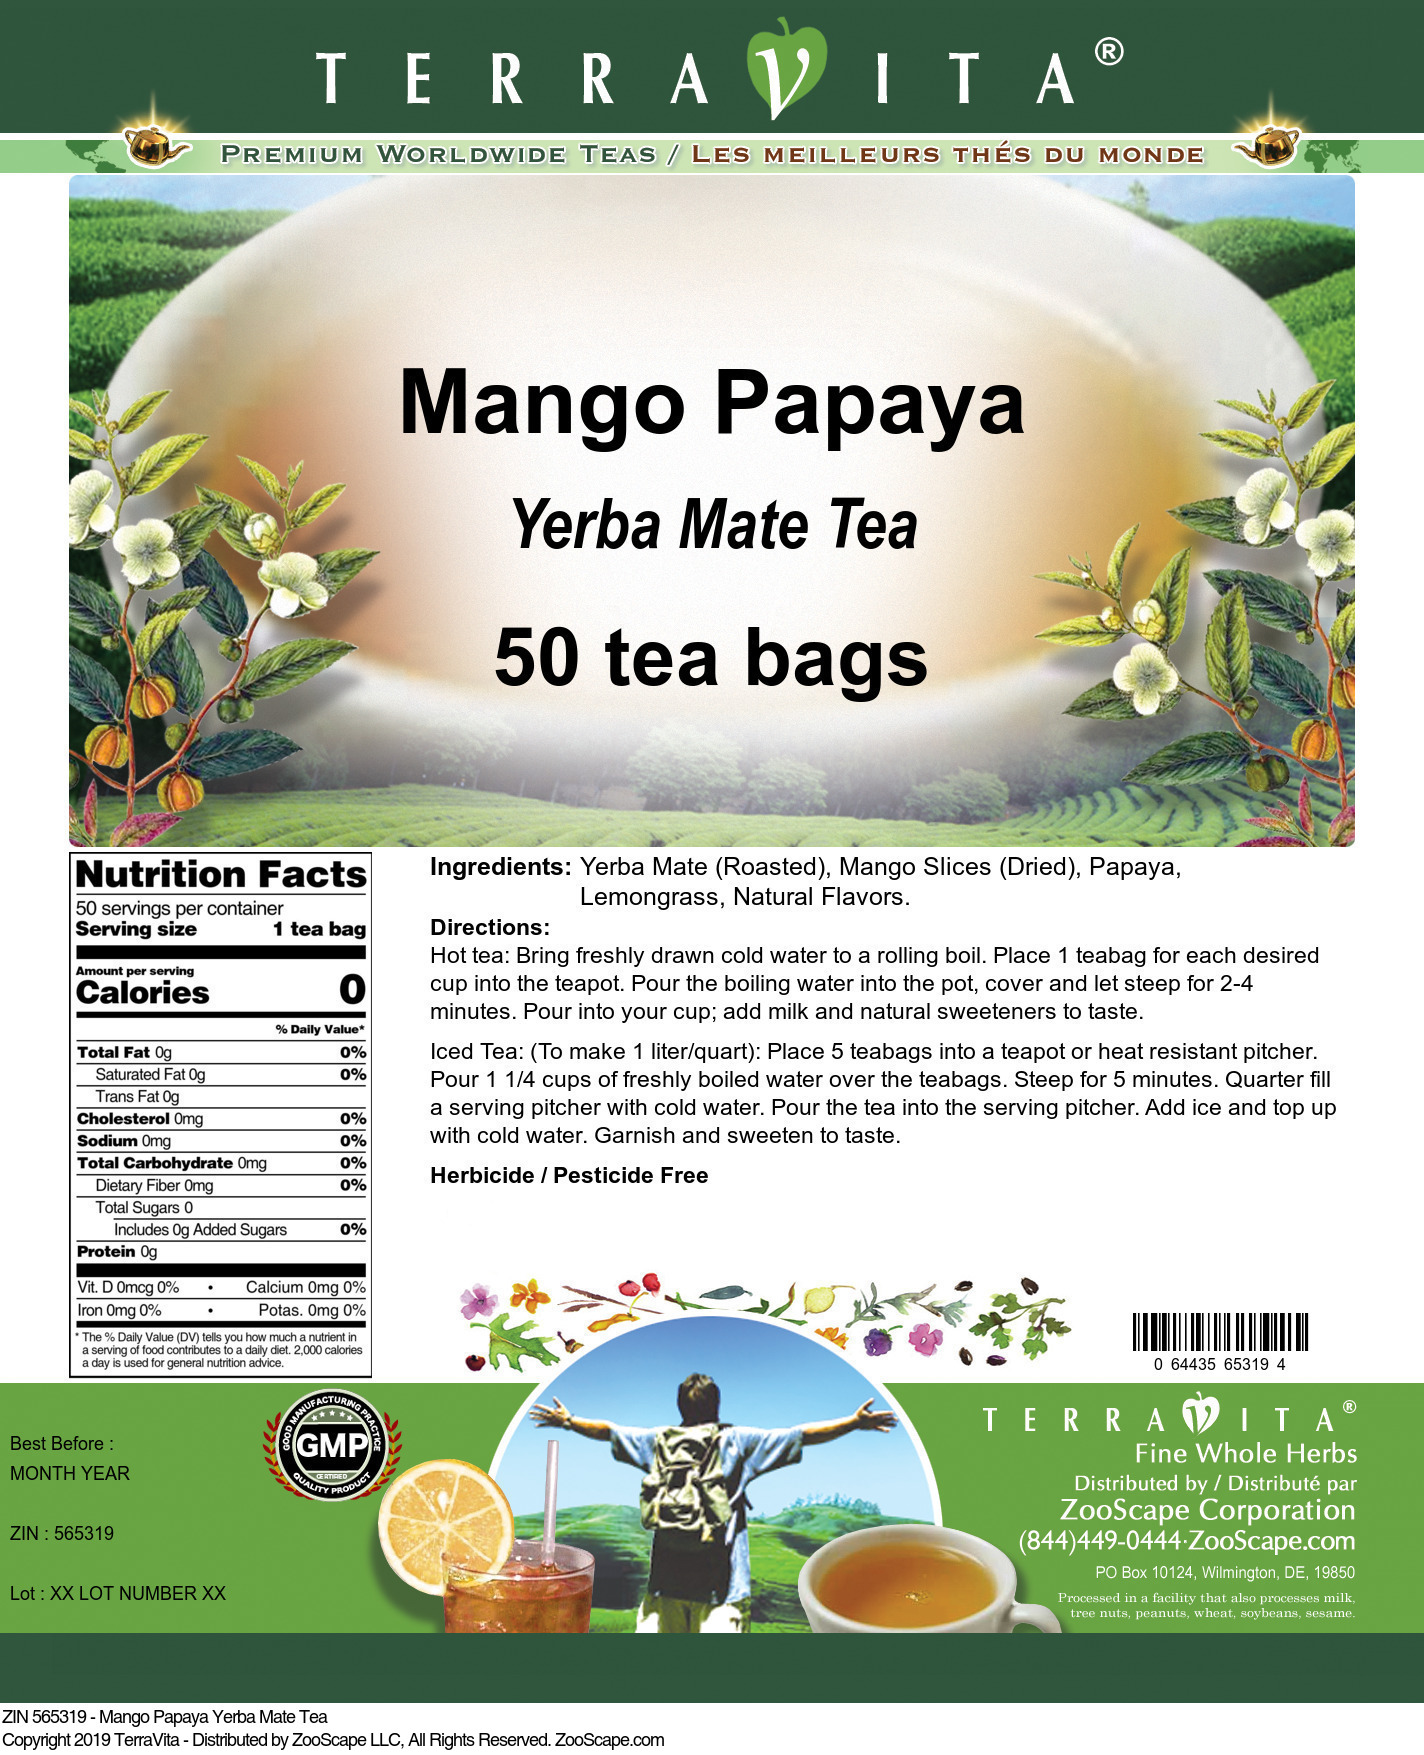 Mango Papaya Yerba Mate